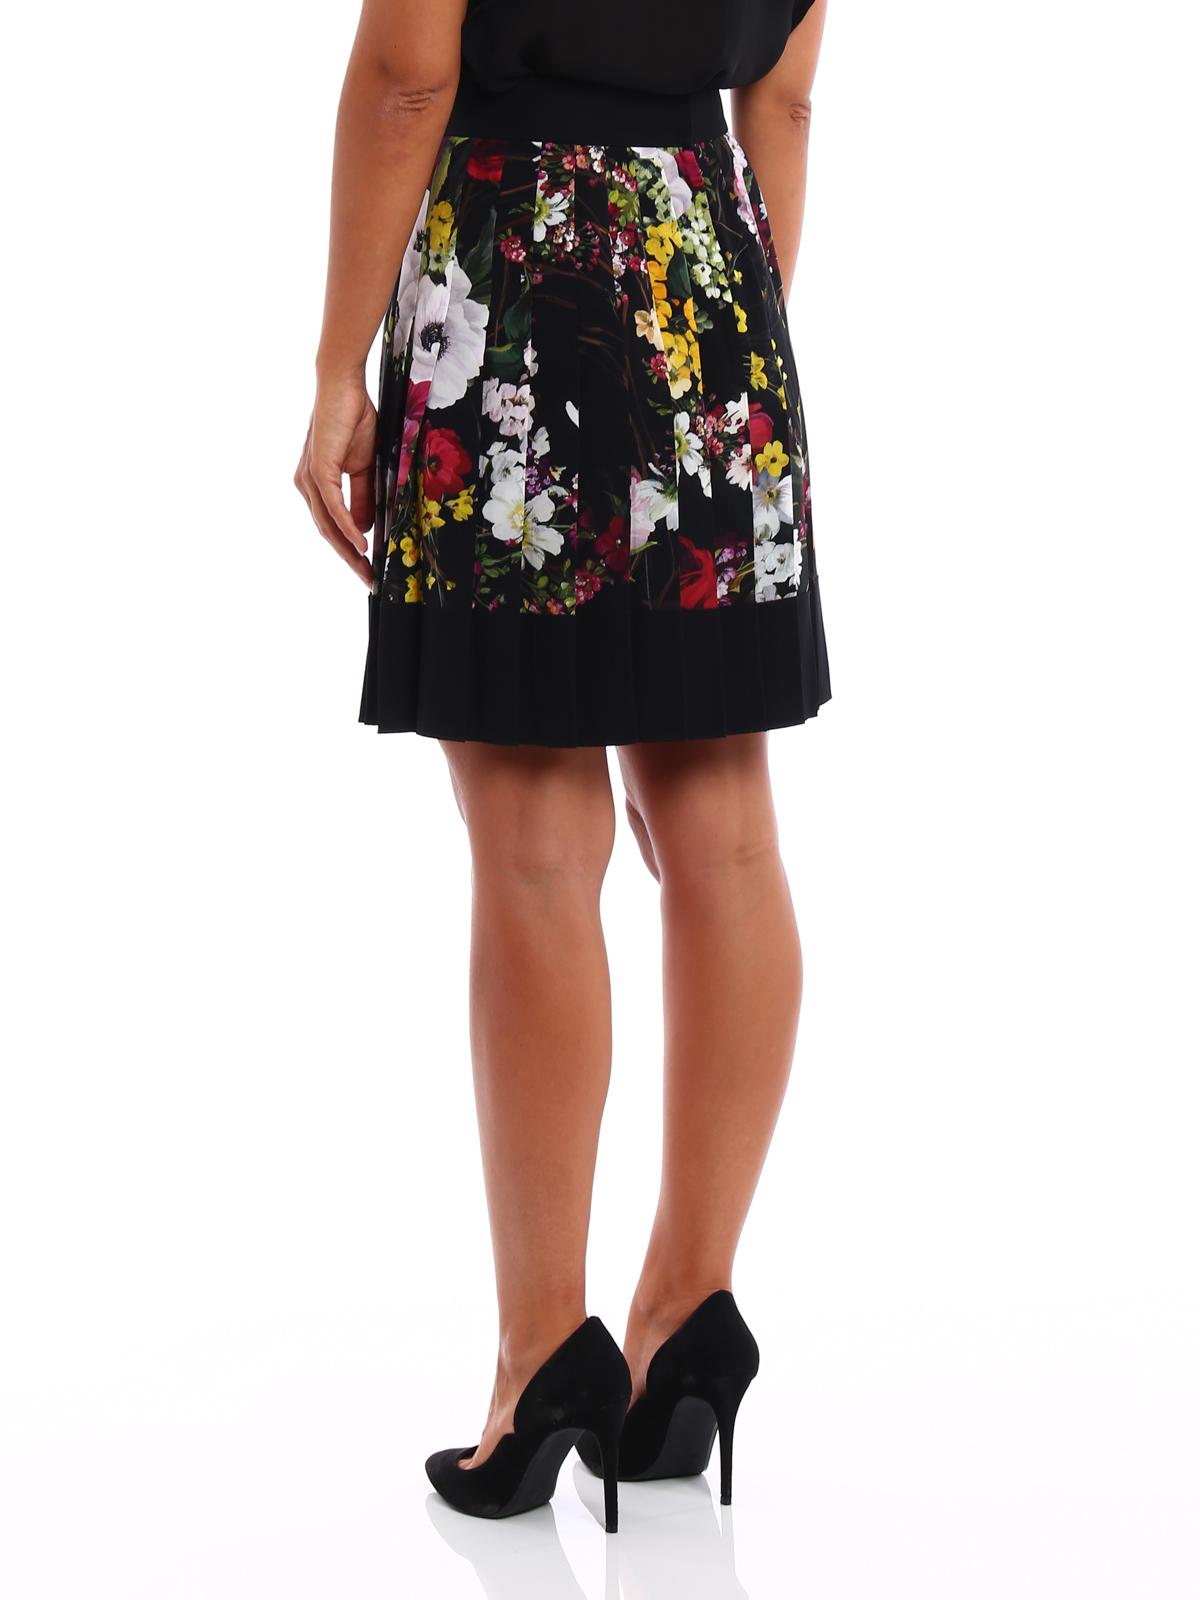 new styles de8ed 1812e Dolce & Gabbana - Gonna plissé in seta a fiori - gonne al ...